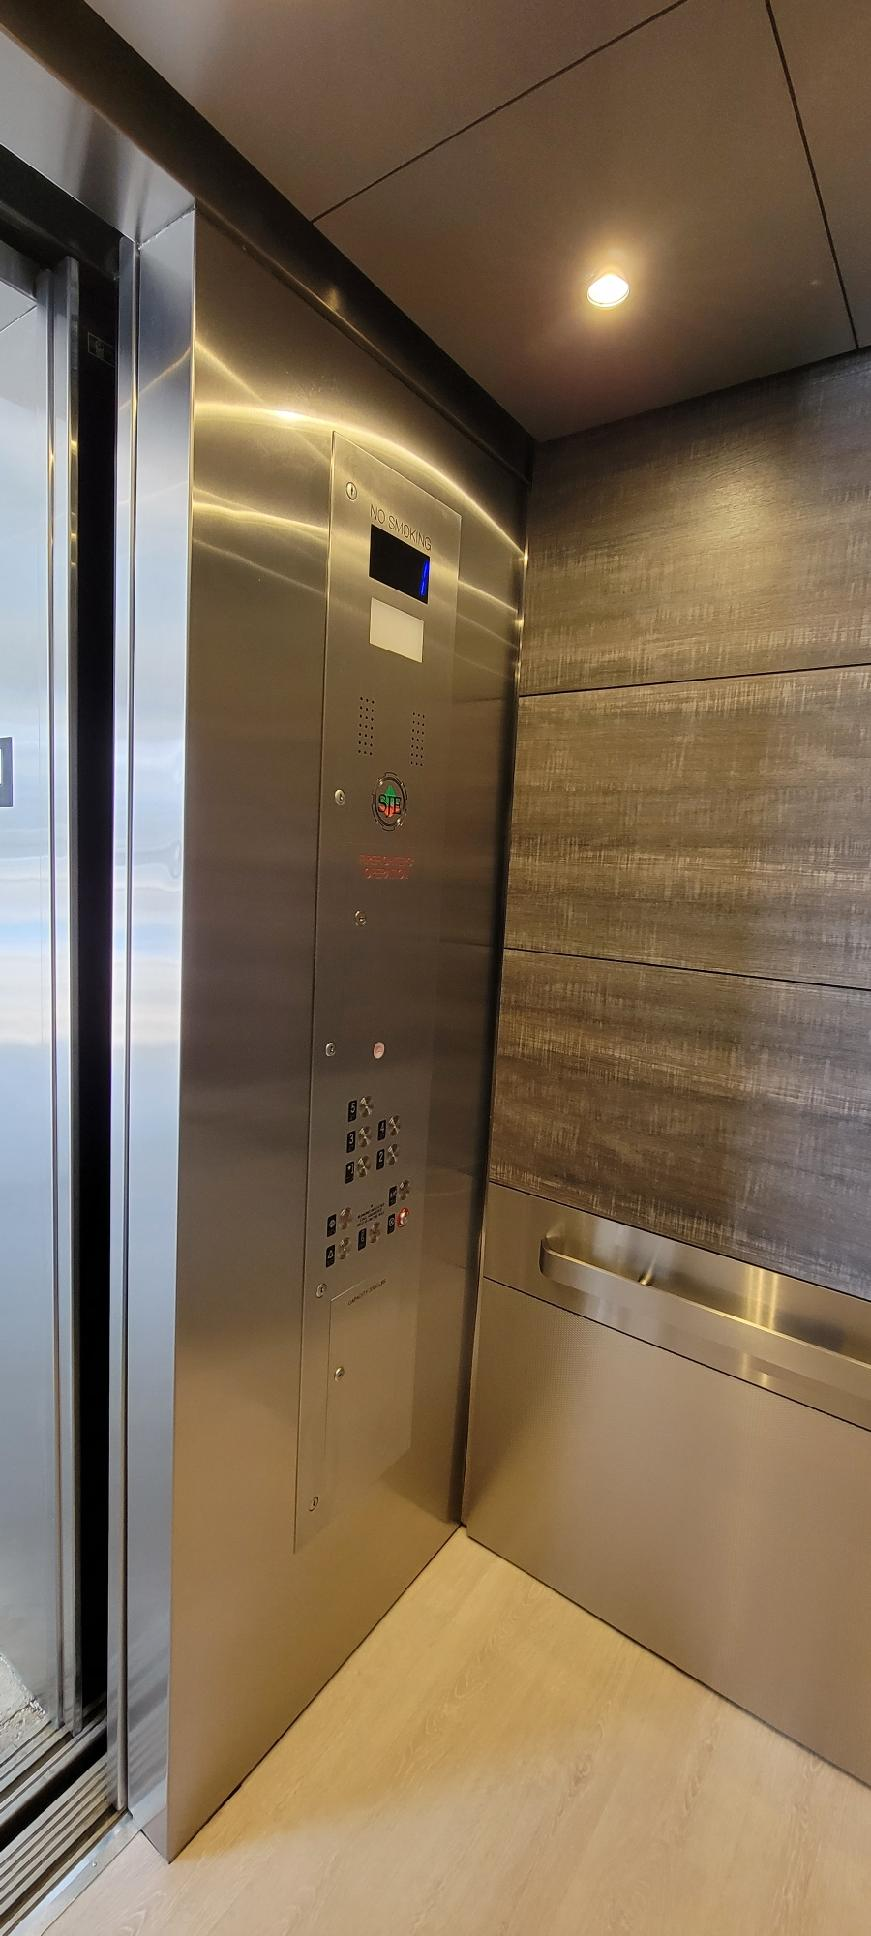 Commercial Elevator Modernization in Wildwood, NJ